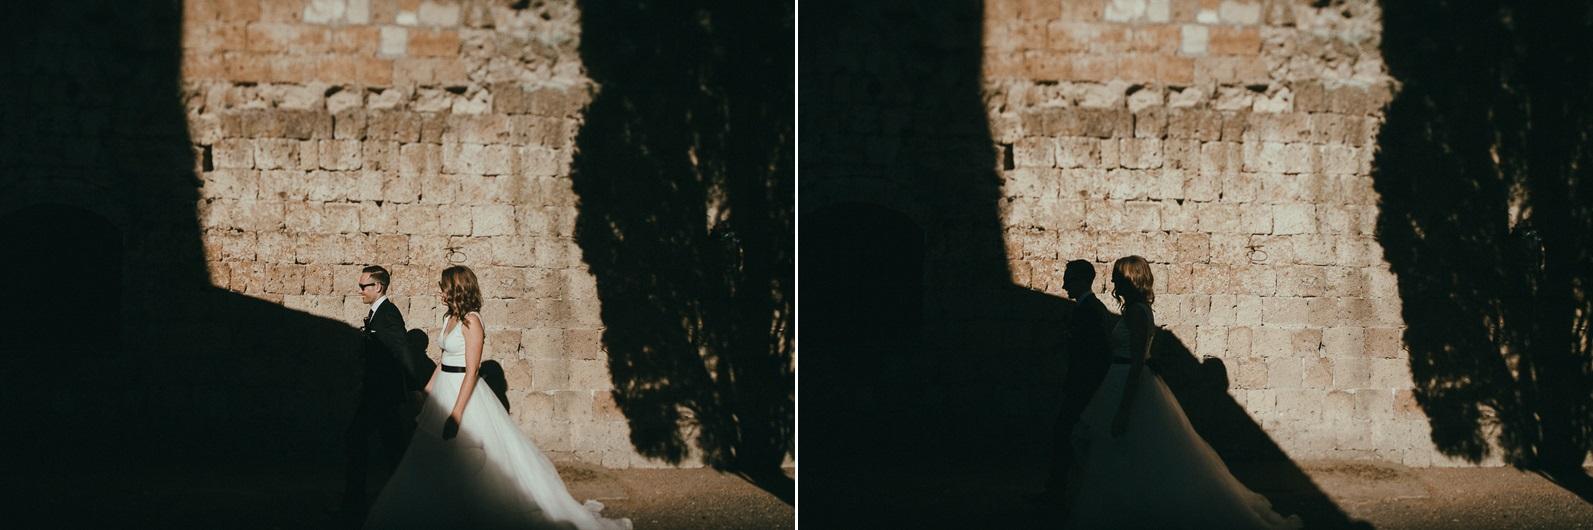 stylish-elopement-photographer-italy (96).jpg